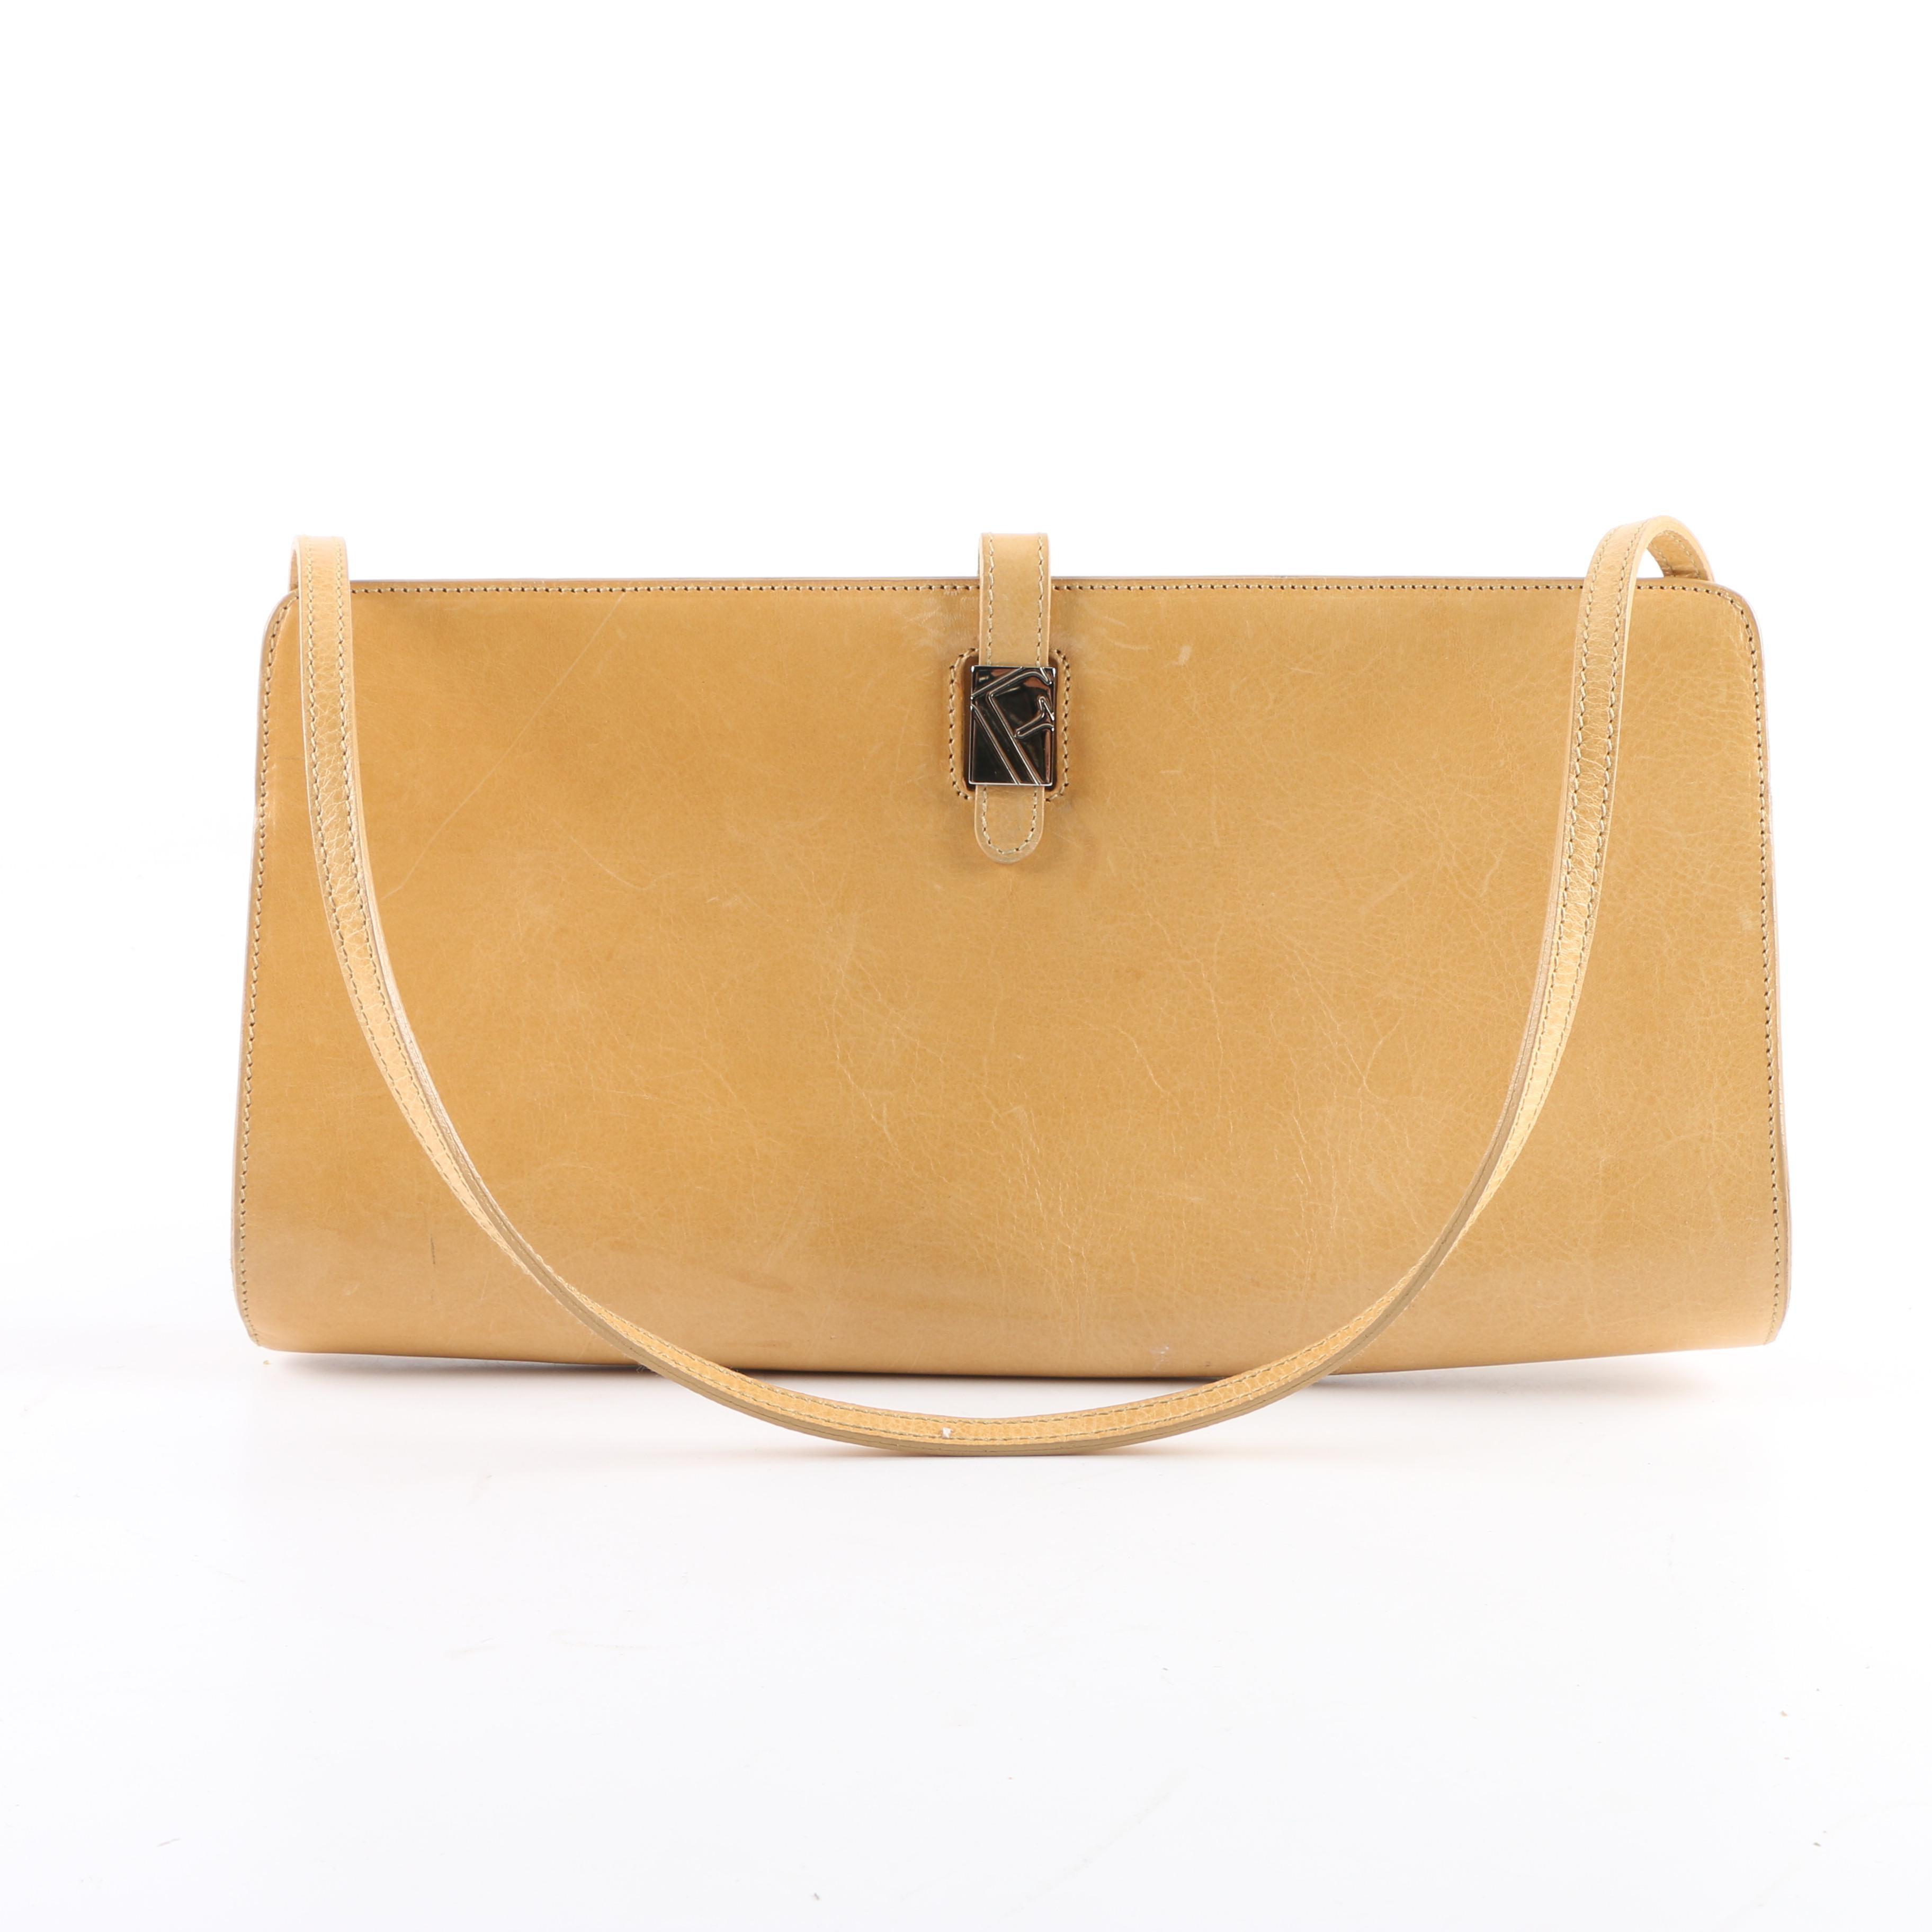 Furla Yellow Leather Baguette Bag